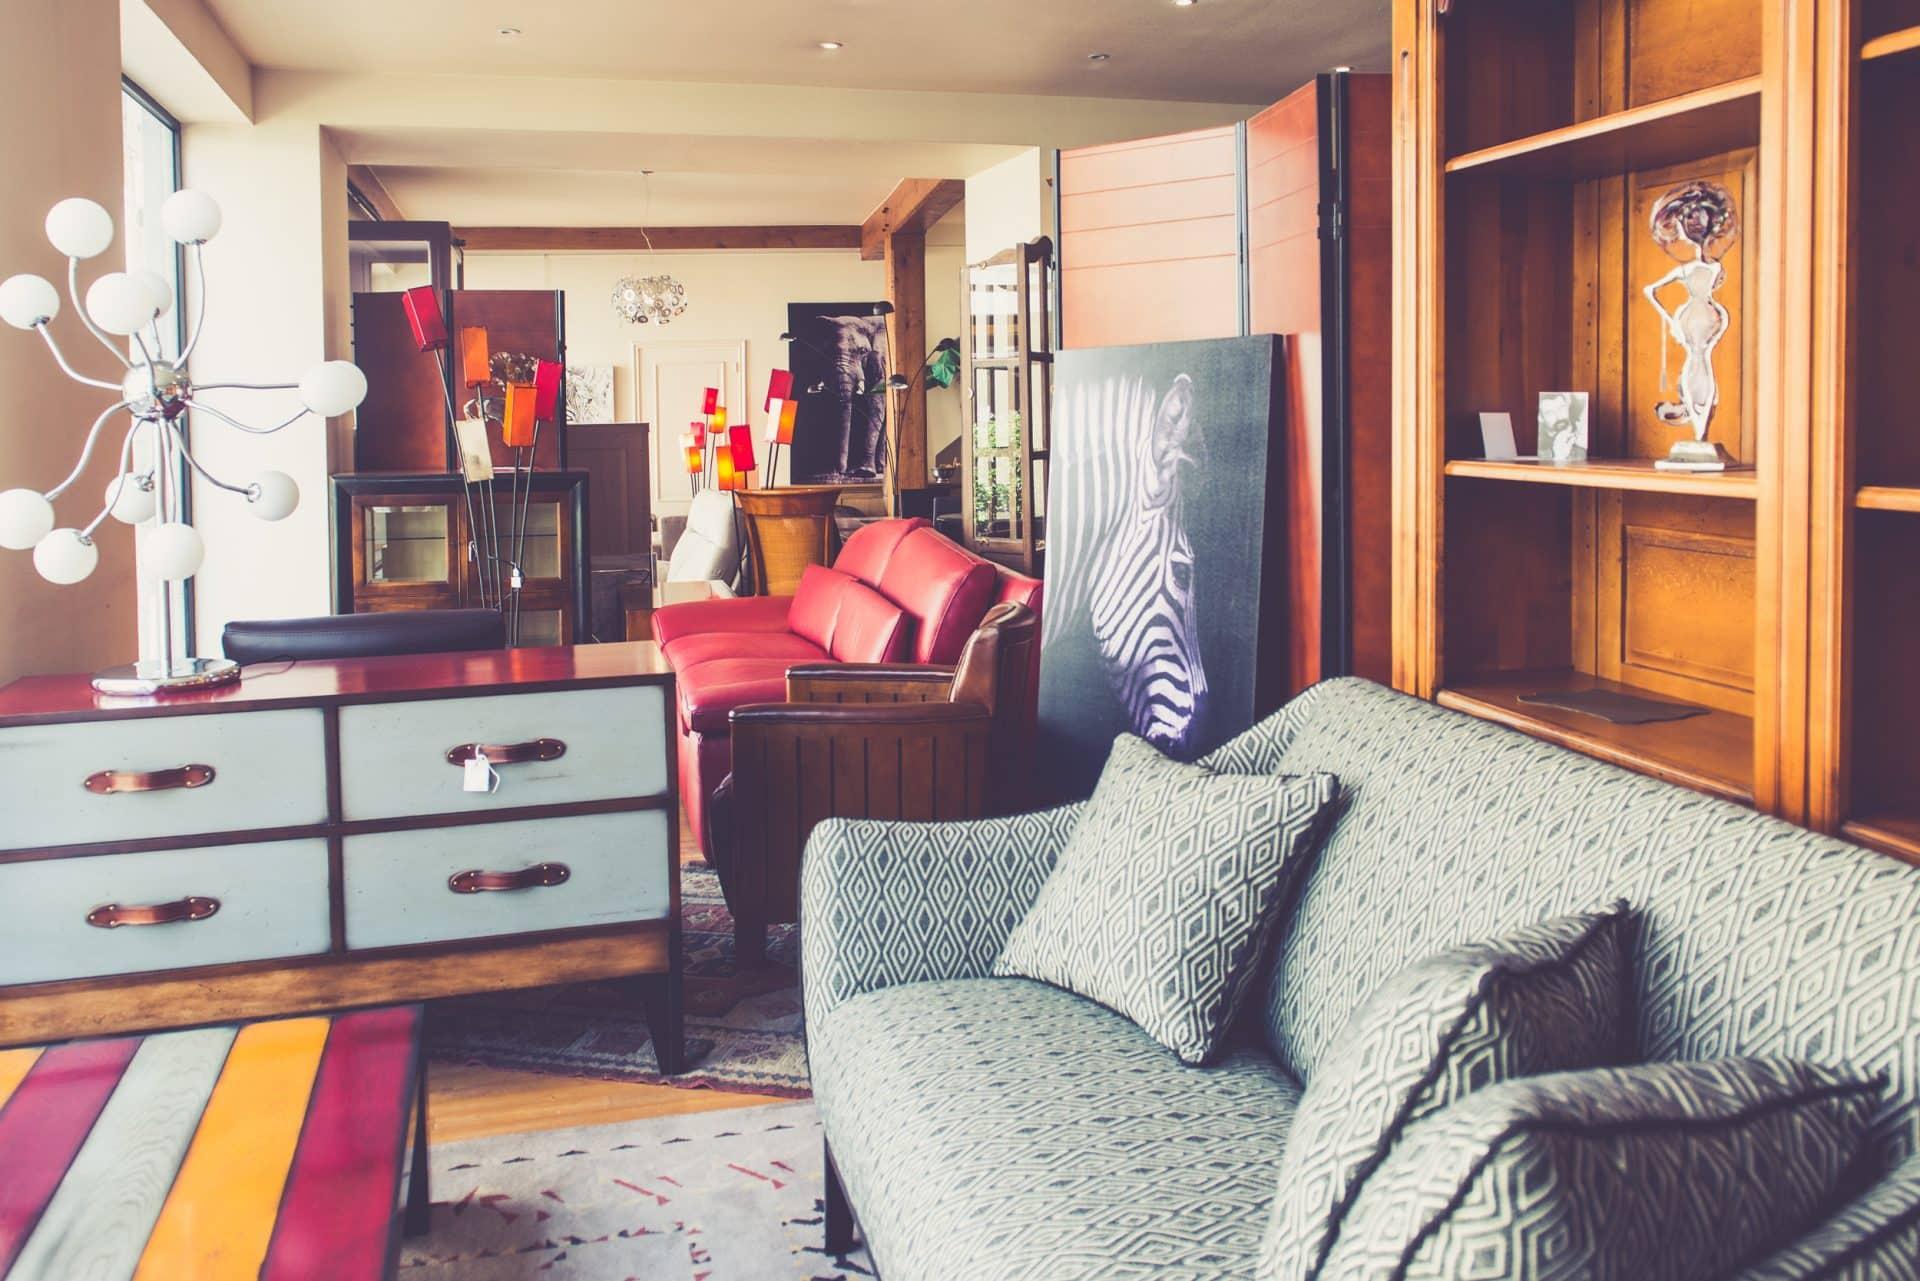 mobilier et dcoration top mobilier bahut noirblanc with mobilier et dcoration gallery of large. Black Bedroom Furniture Sets. Home Design Ideas